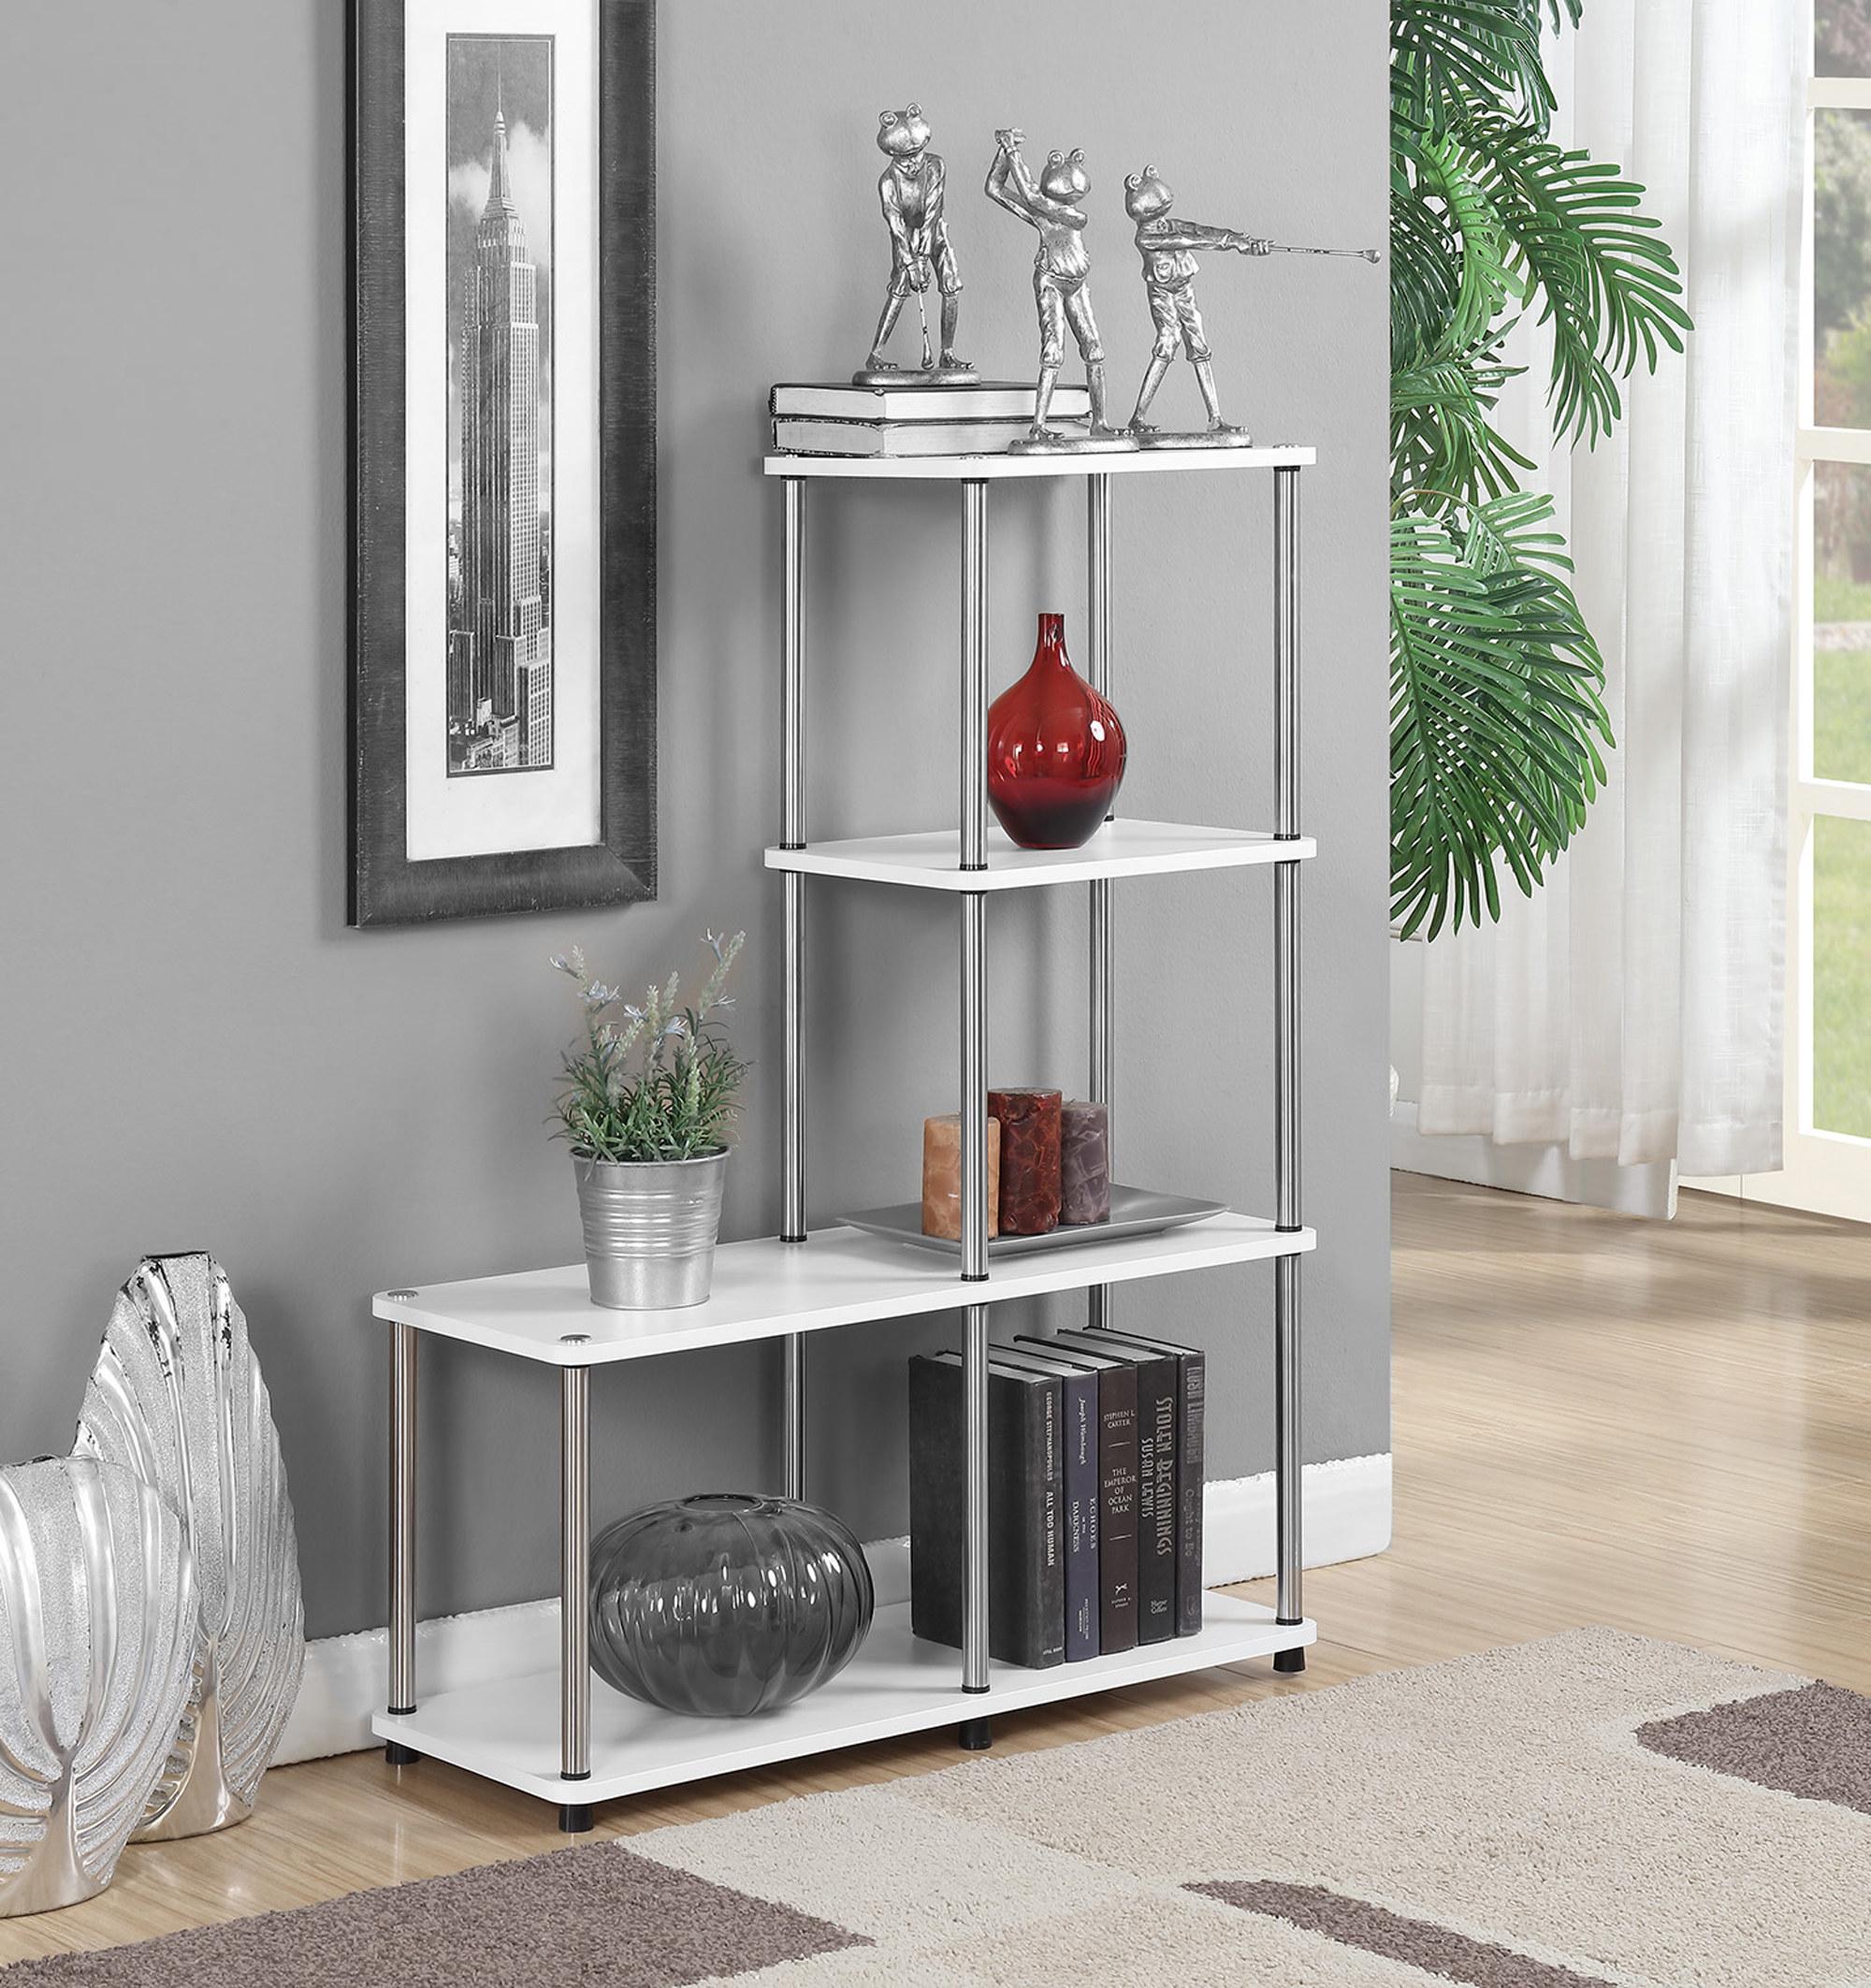 the bookshelf with metal poles and white shelves